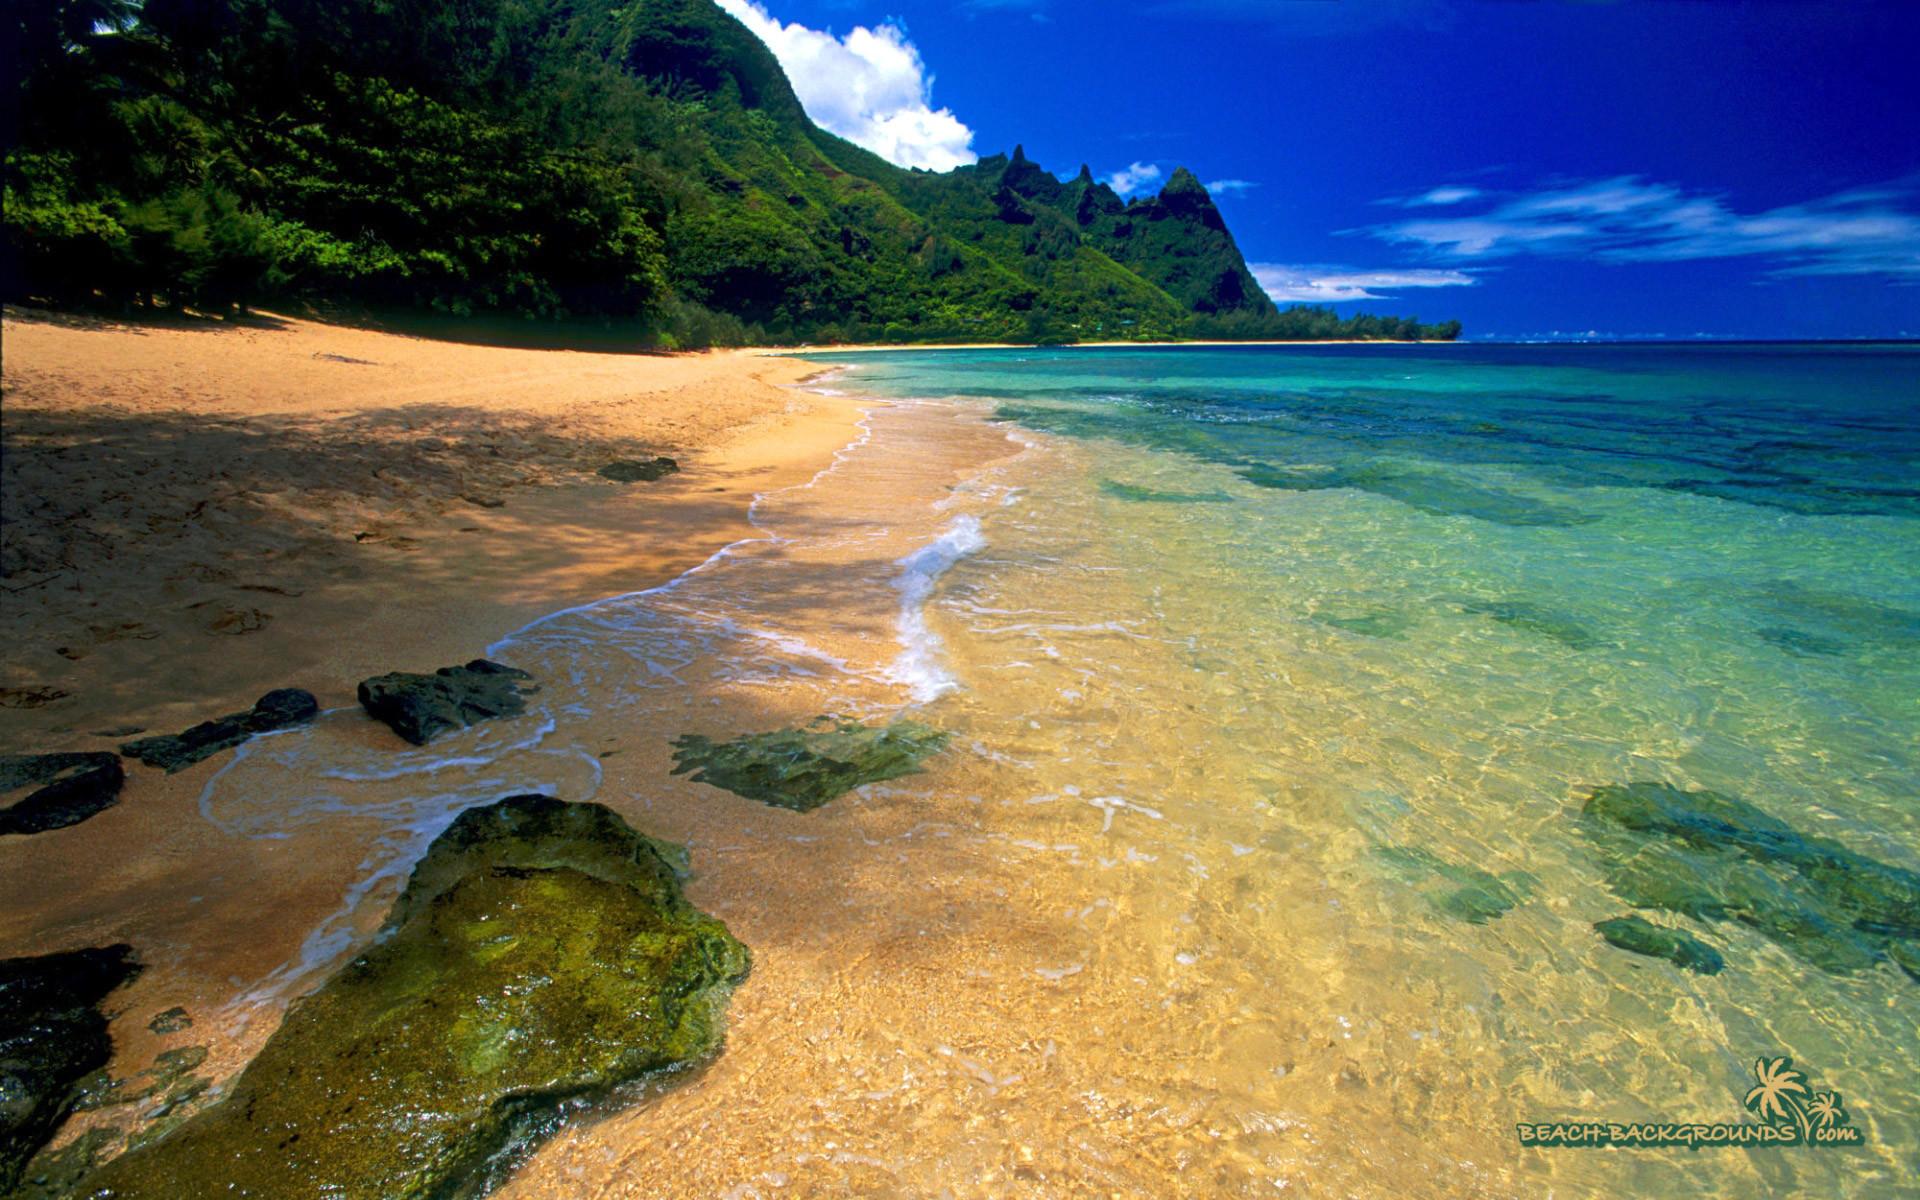 Beautiful Ocean Wallpaper HD   Freetopwallpaper.com